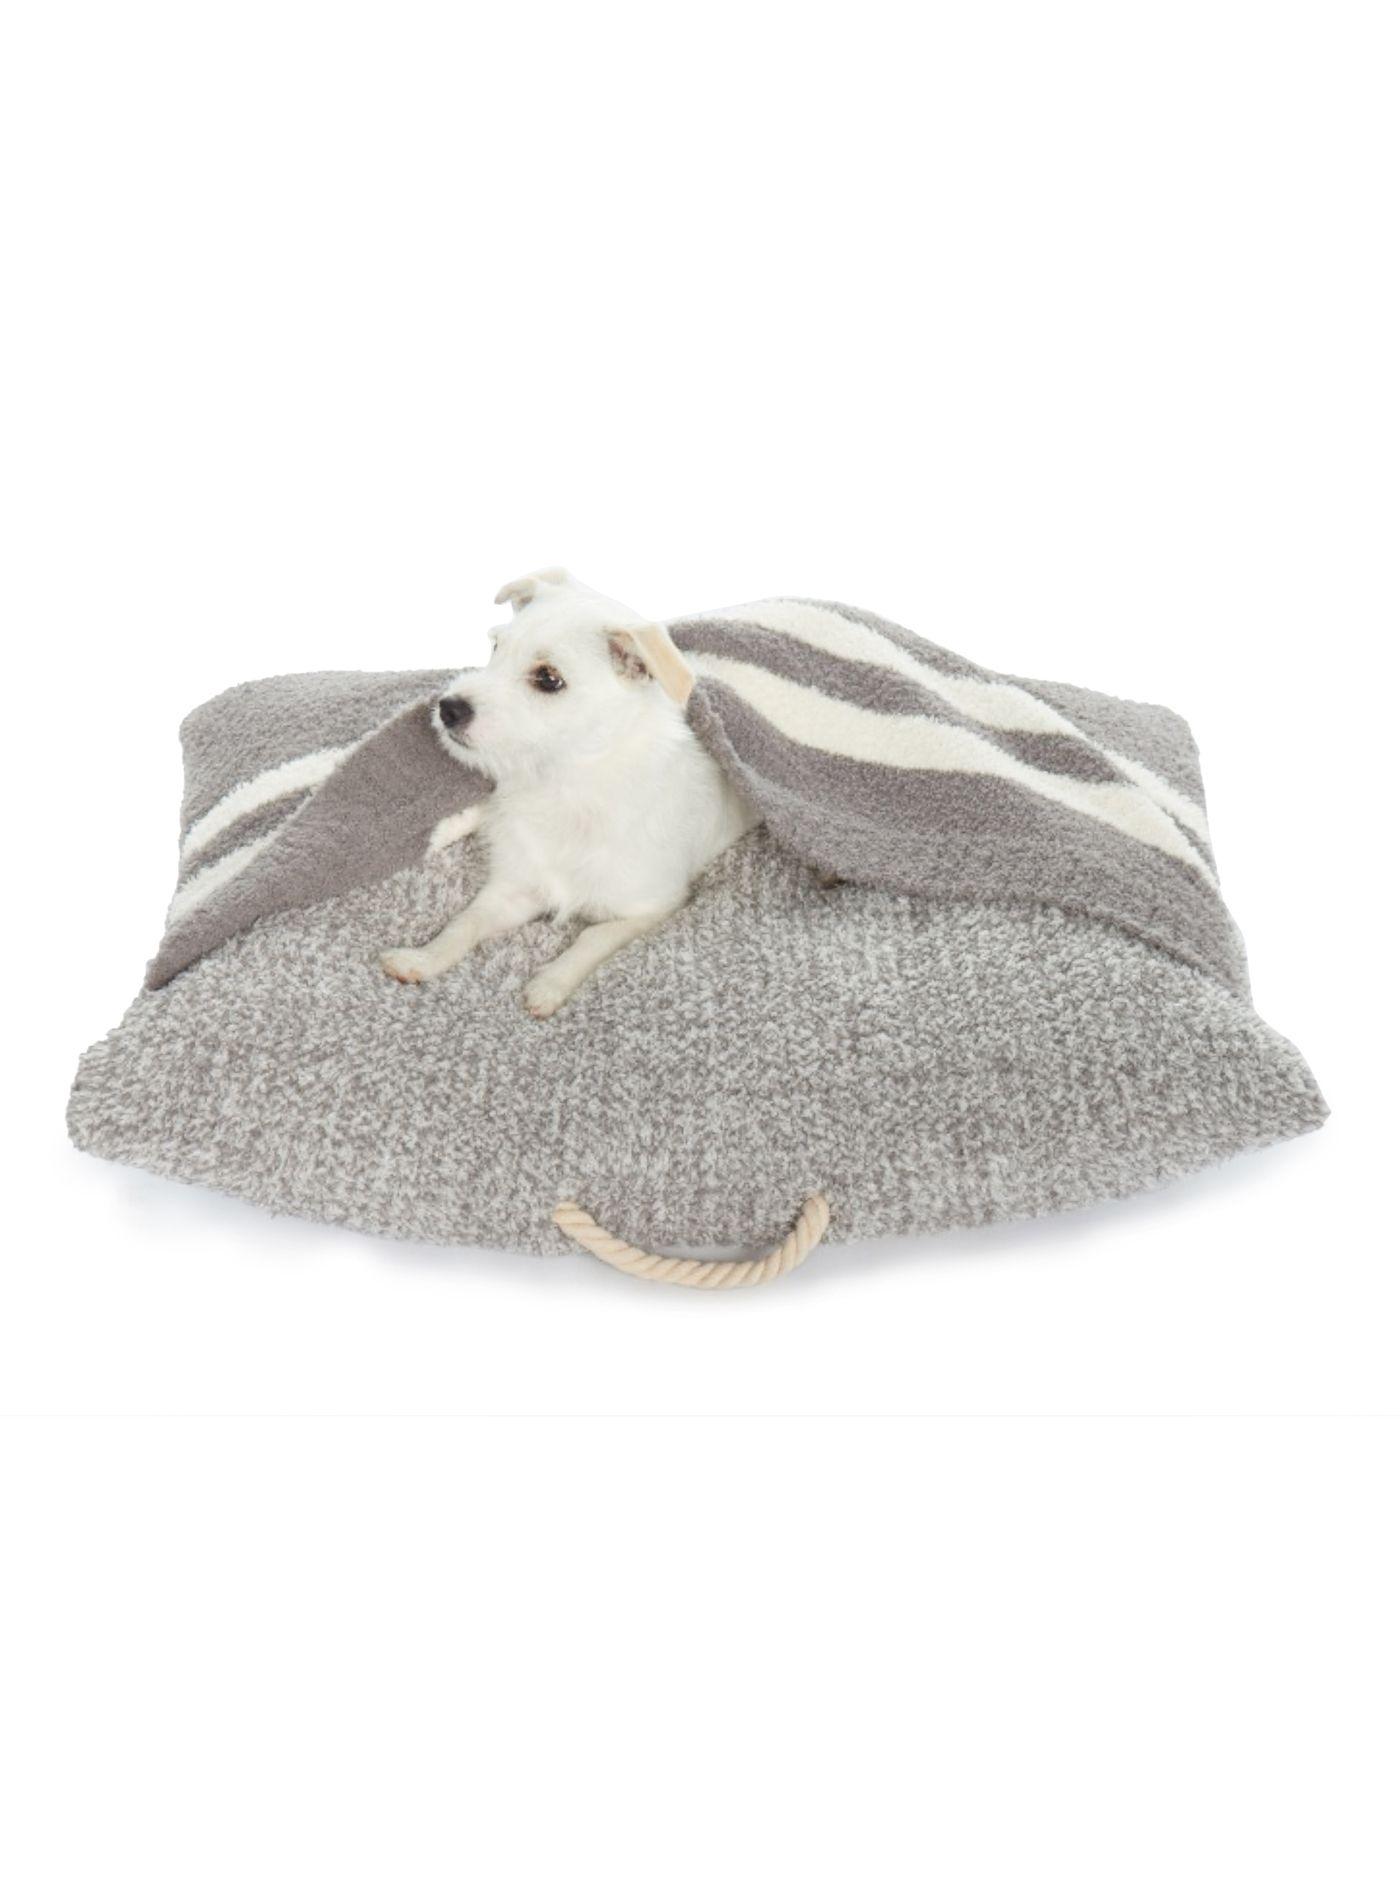 Barefoot Dreams Cozychic Cozy Pet Bed Shopping Pets Pet